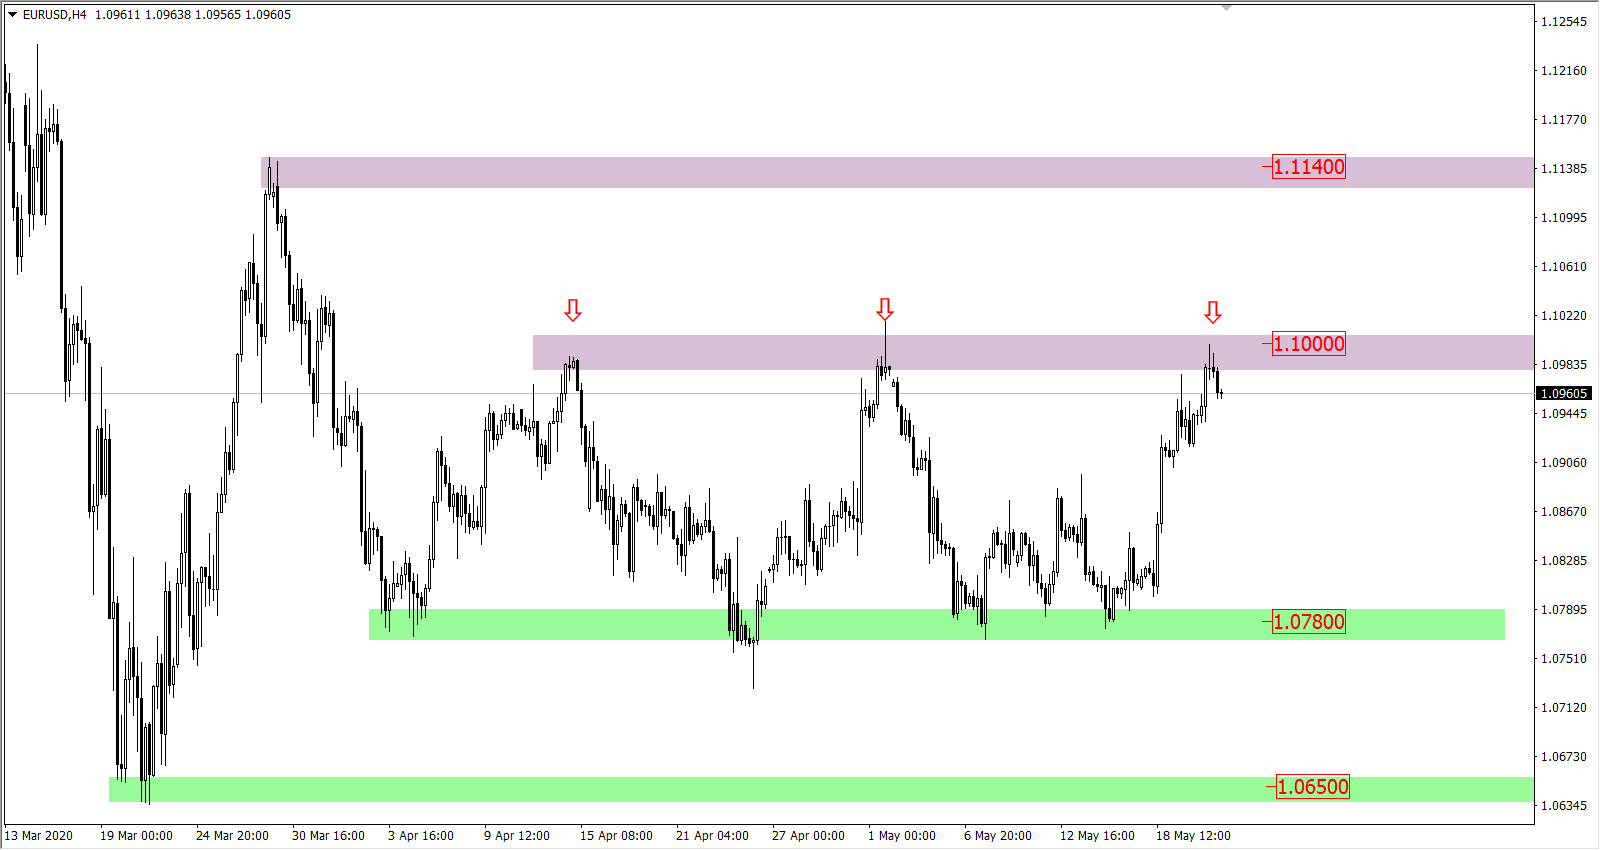 Wykres pary EURUSD